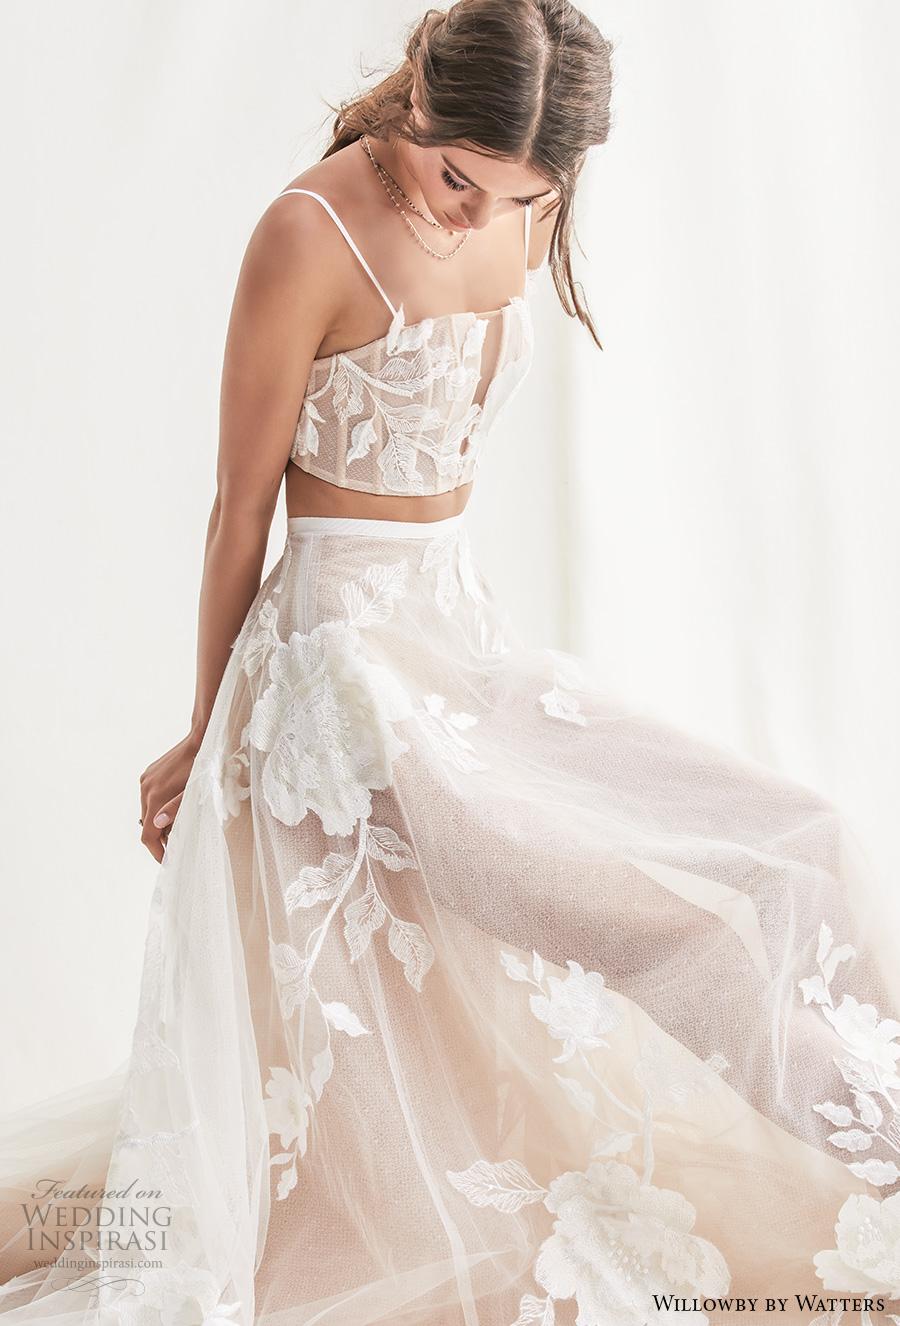 Willowby by Watters Spring 2019 Wedding Dresses  Wedding Inspirasi